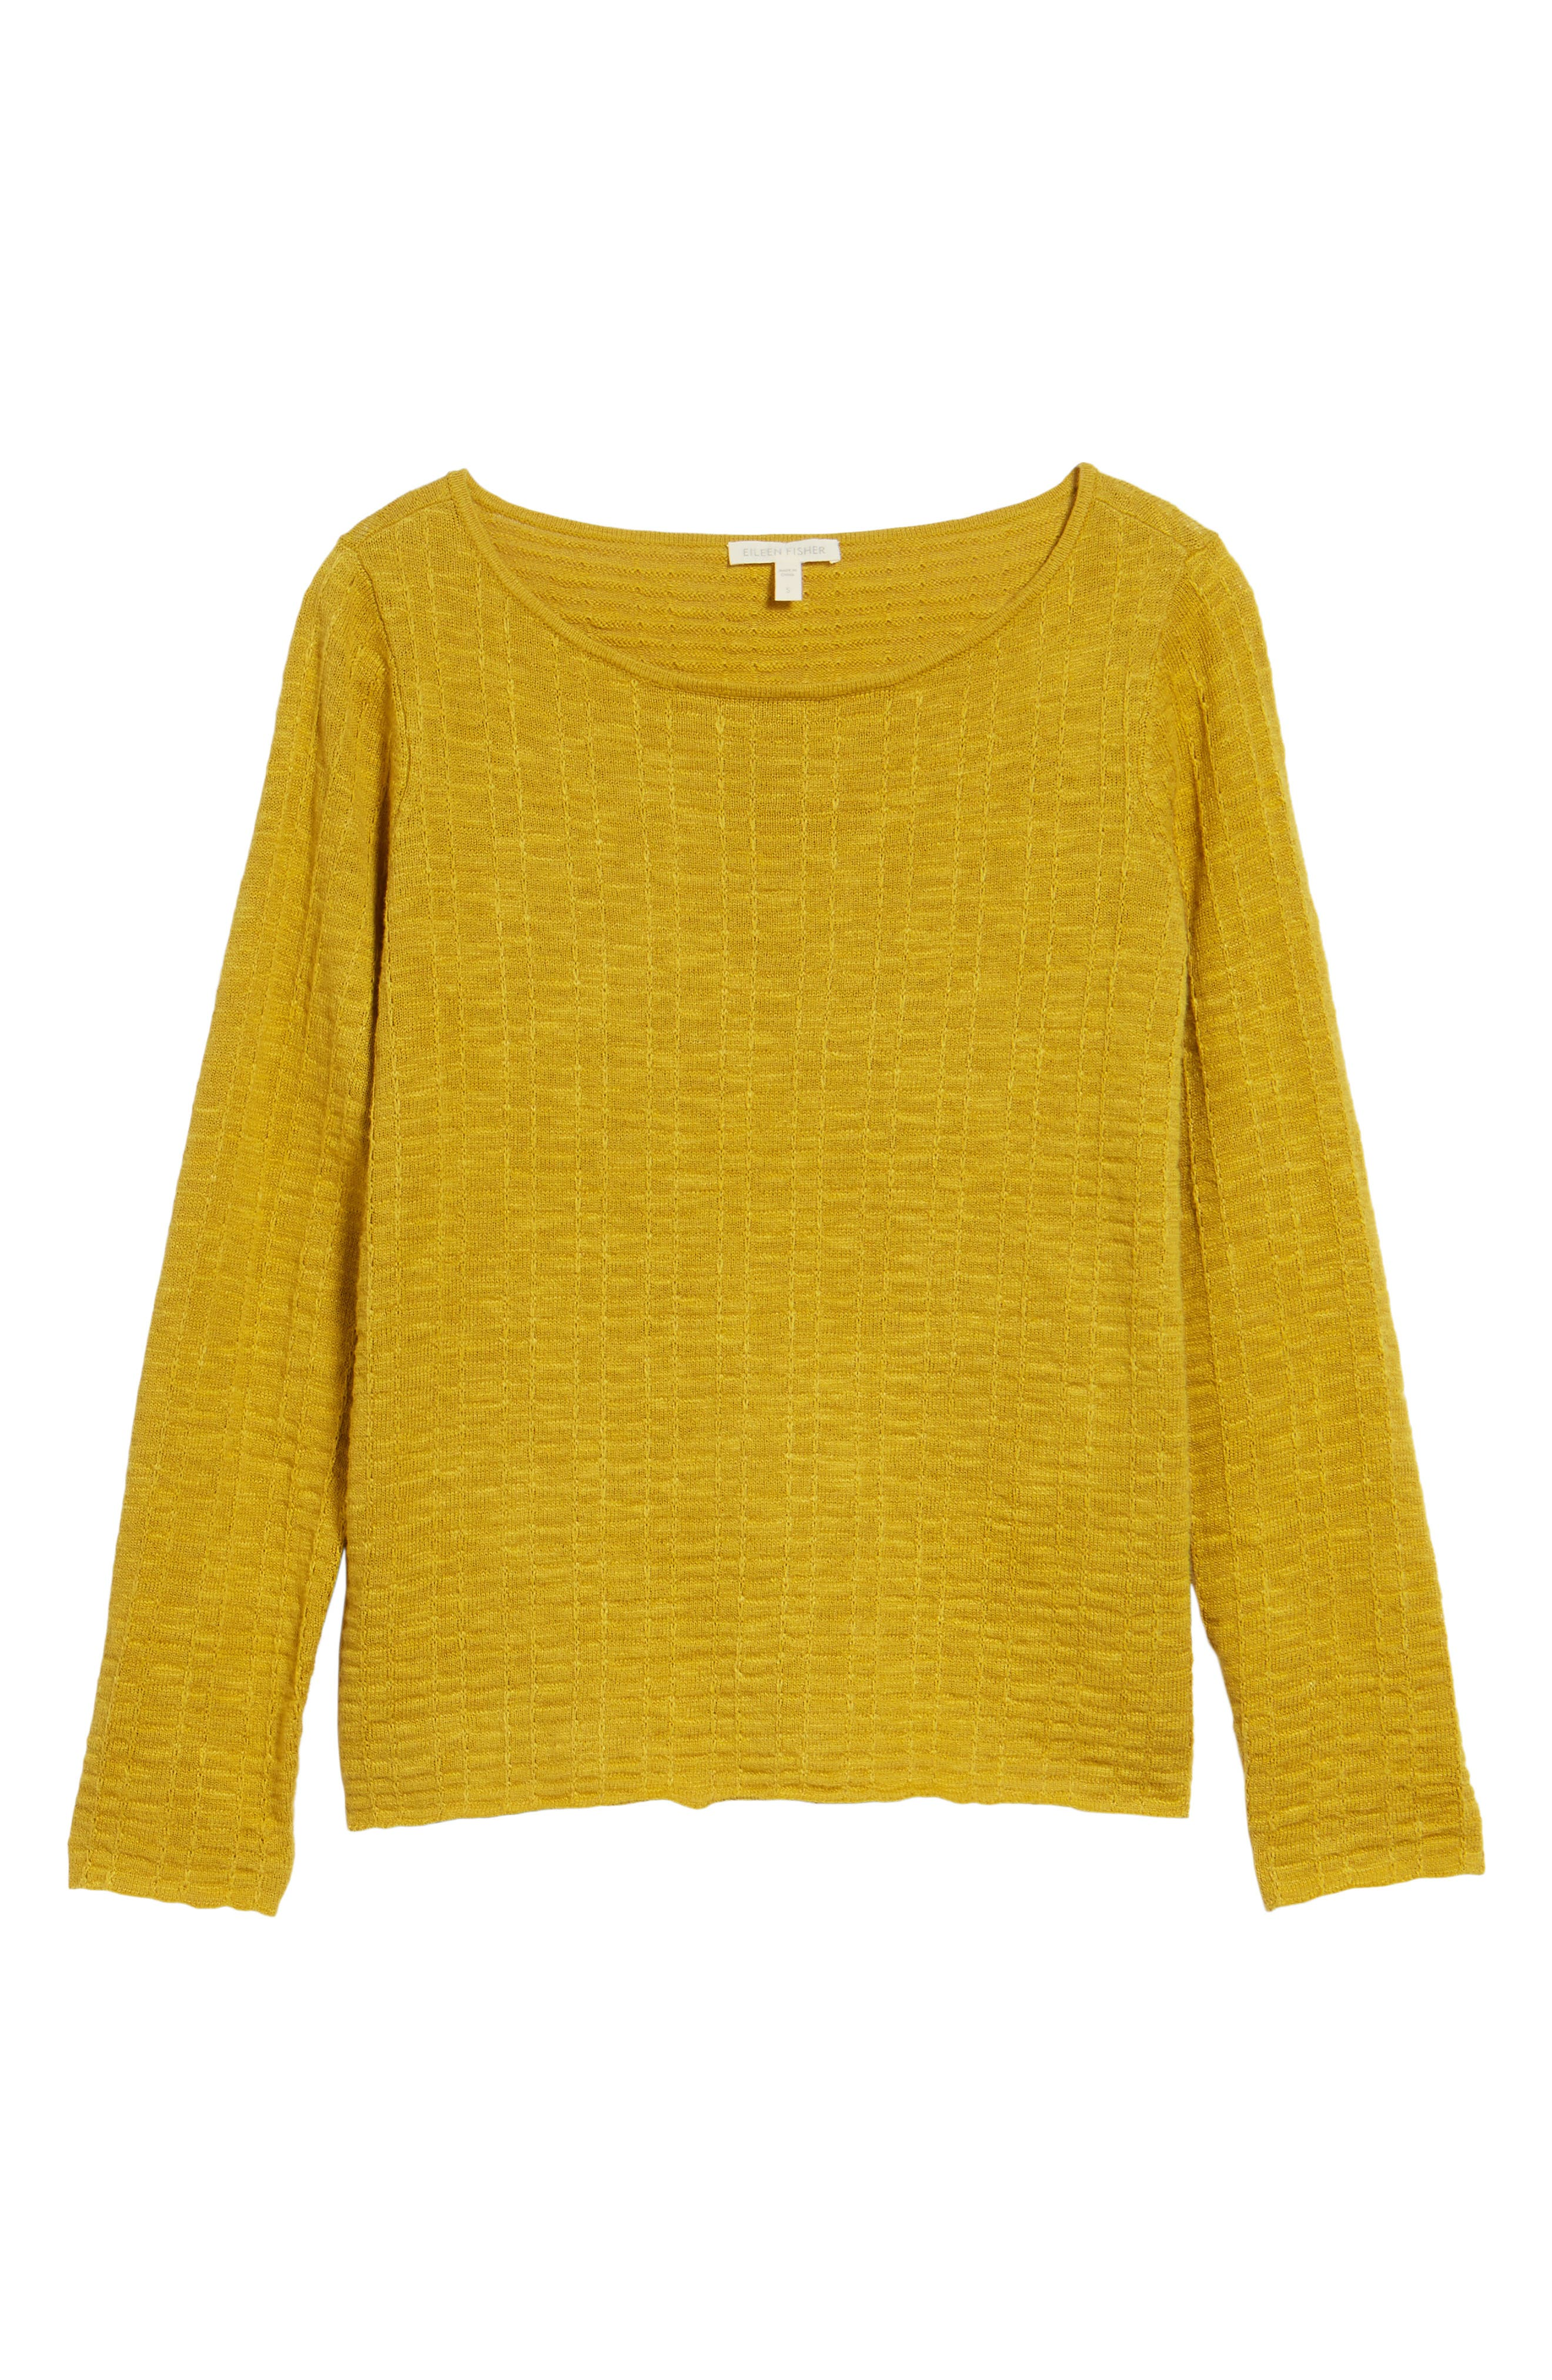 Organic Linen & Cotton Sweater,                             Alternate thumbnail 6, color,                             Mustard Seed